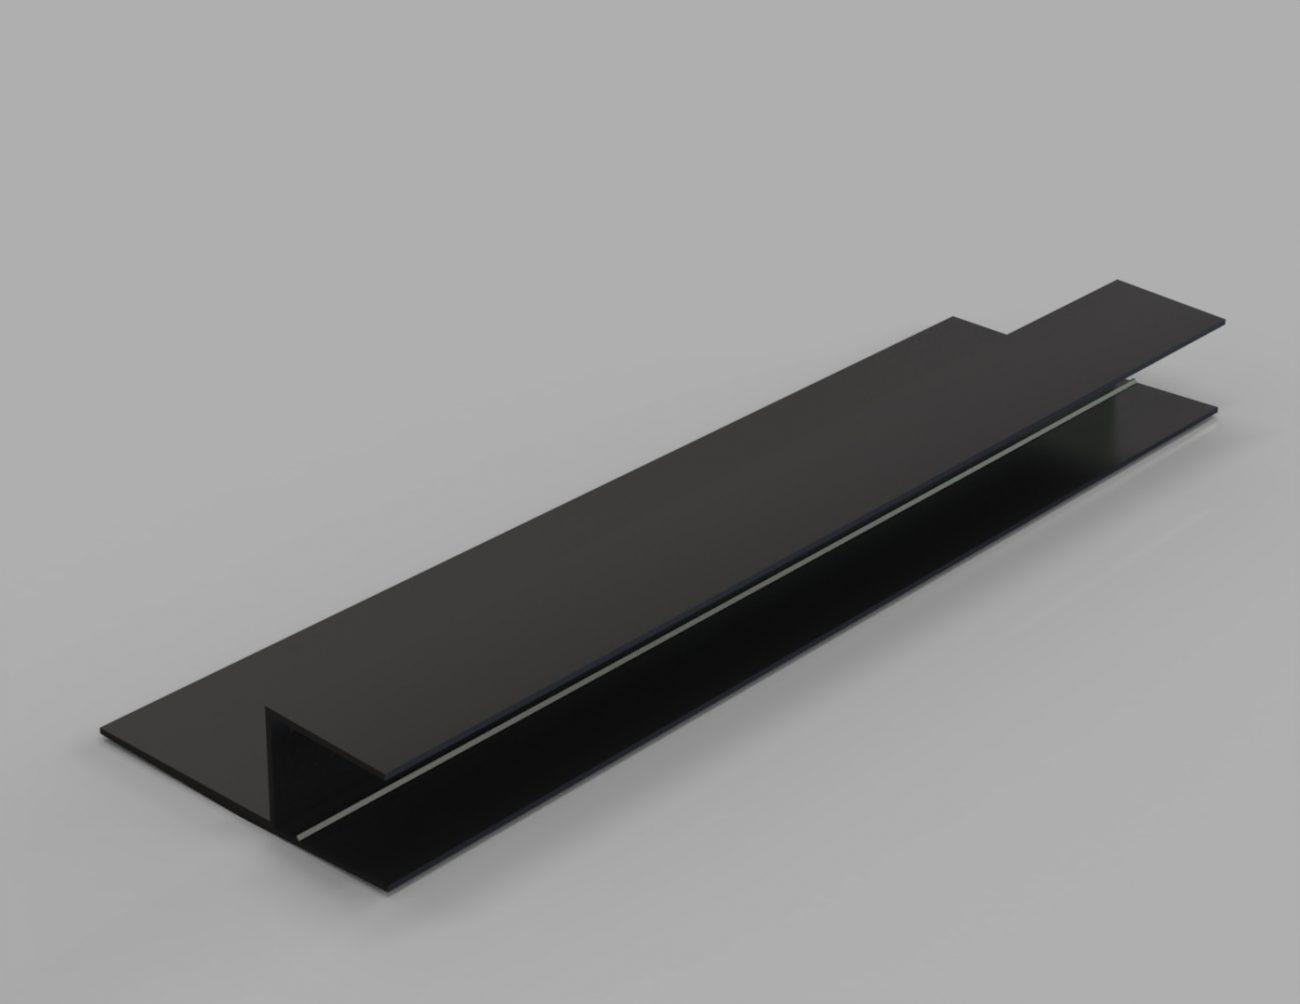 PS-18C-8 Black Уплотнитель